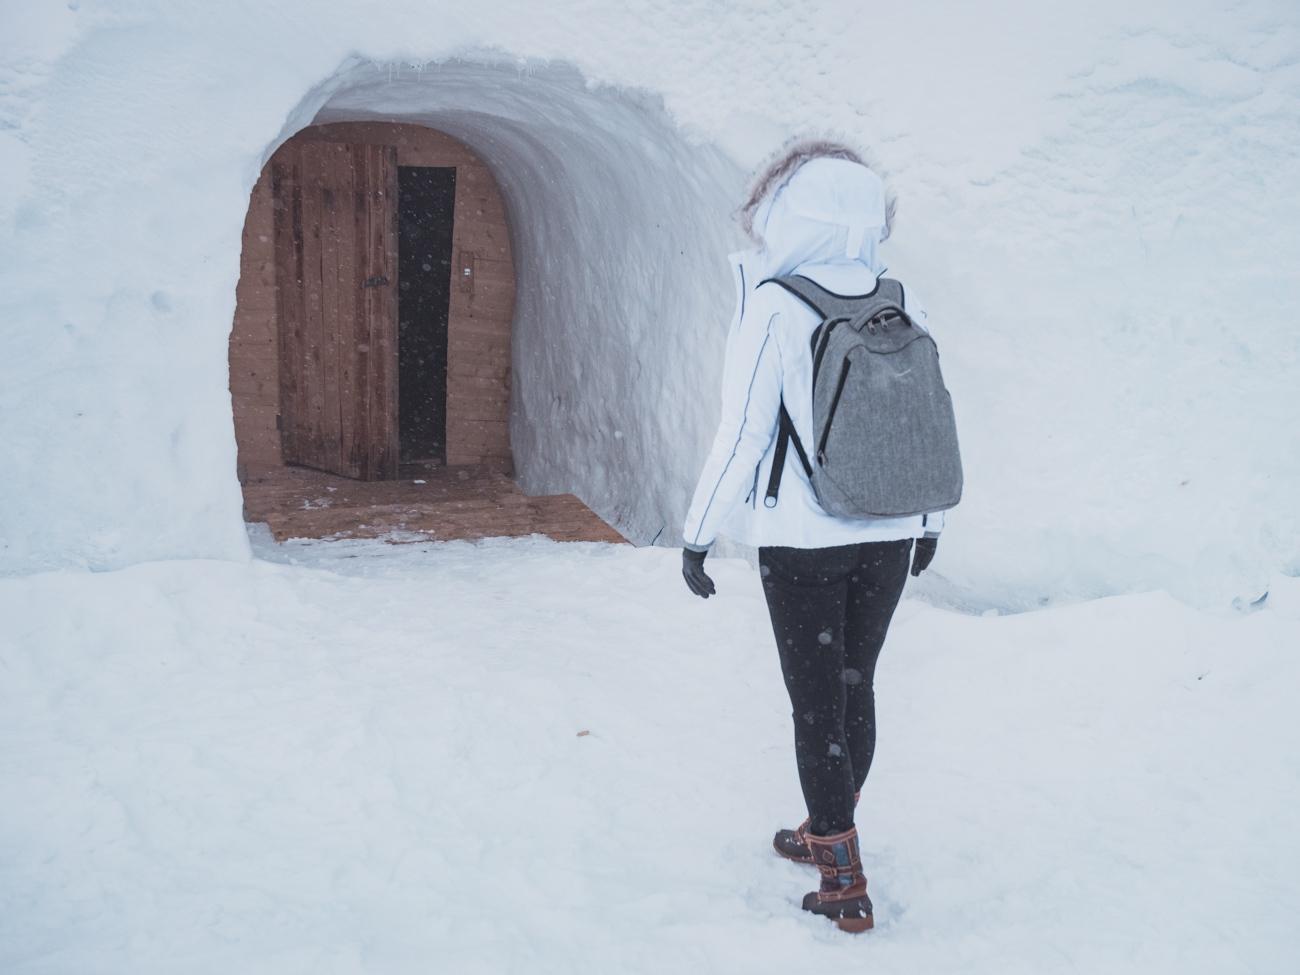 innsbruck nordkette iglo